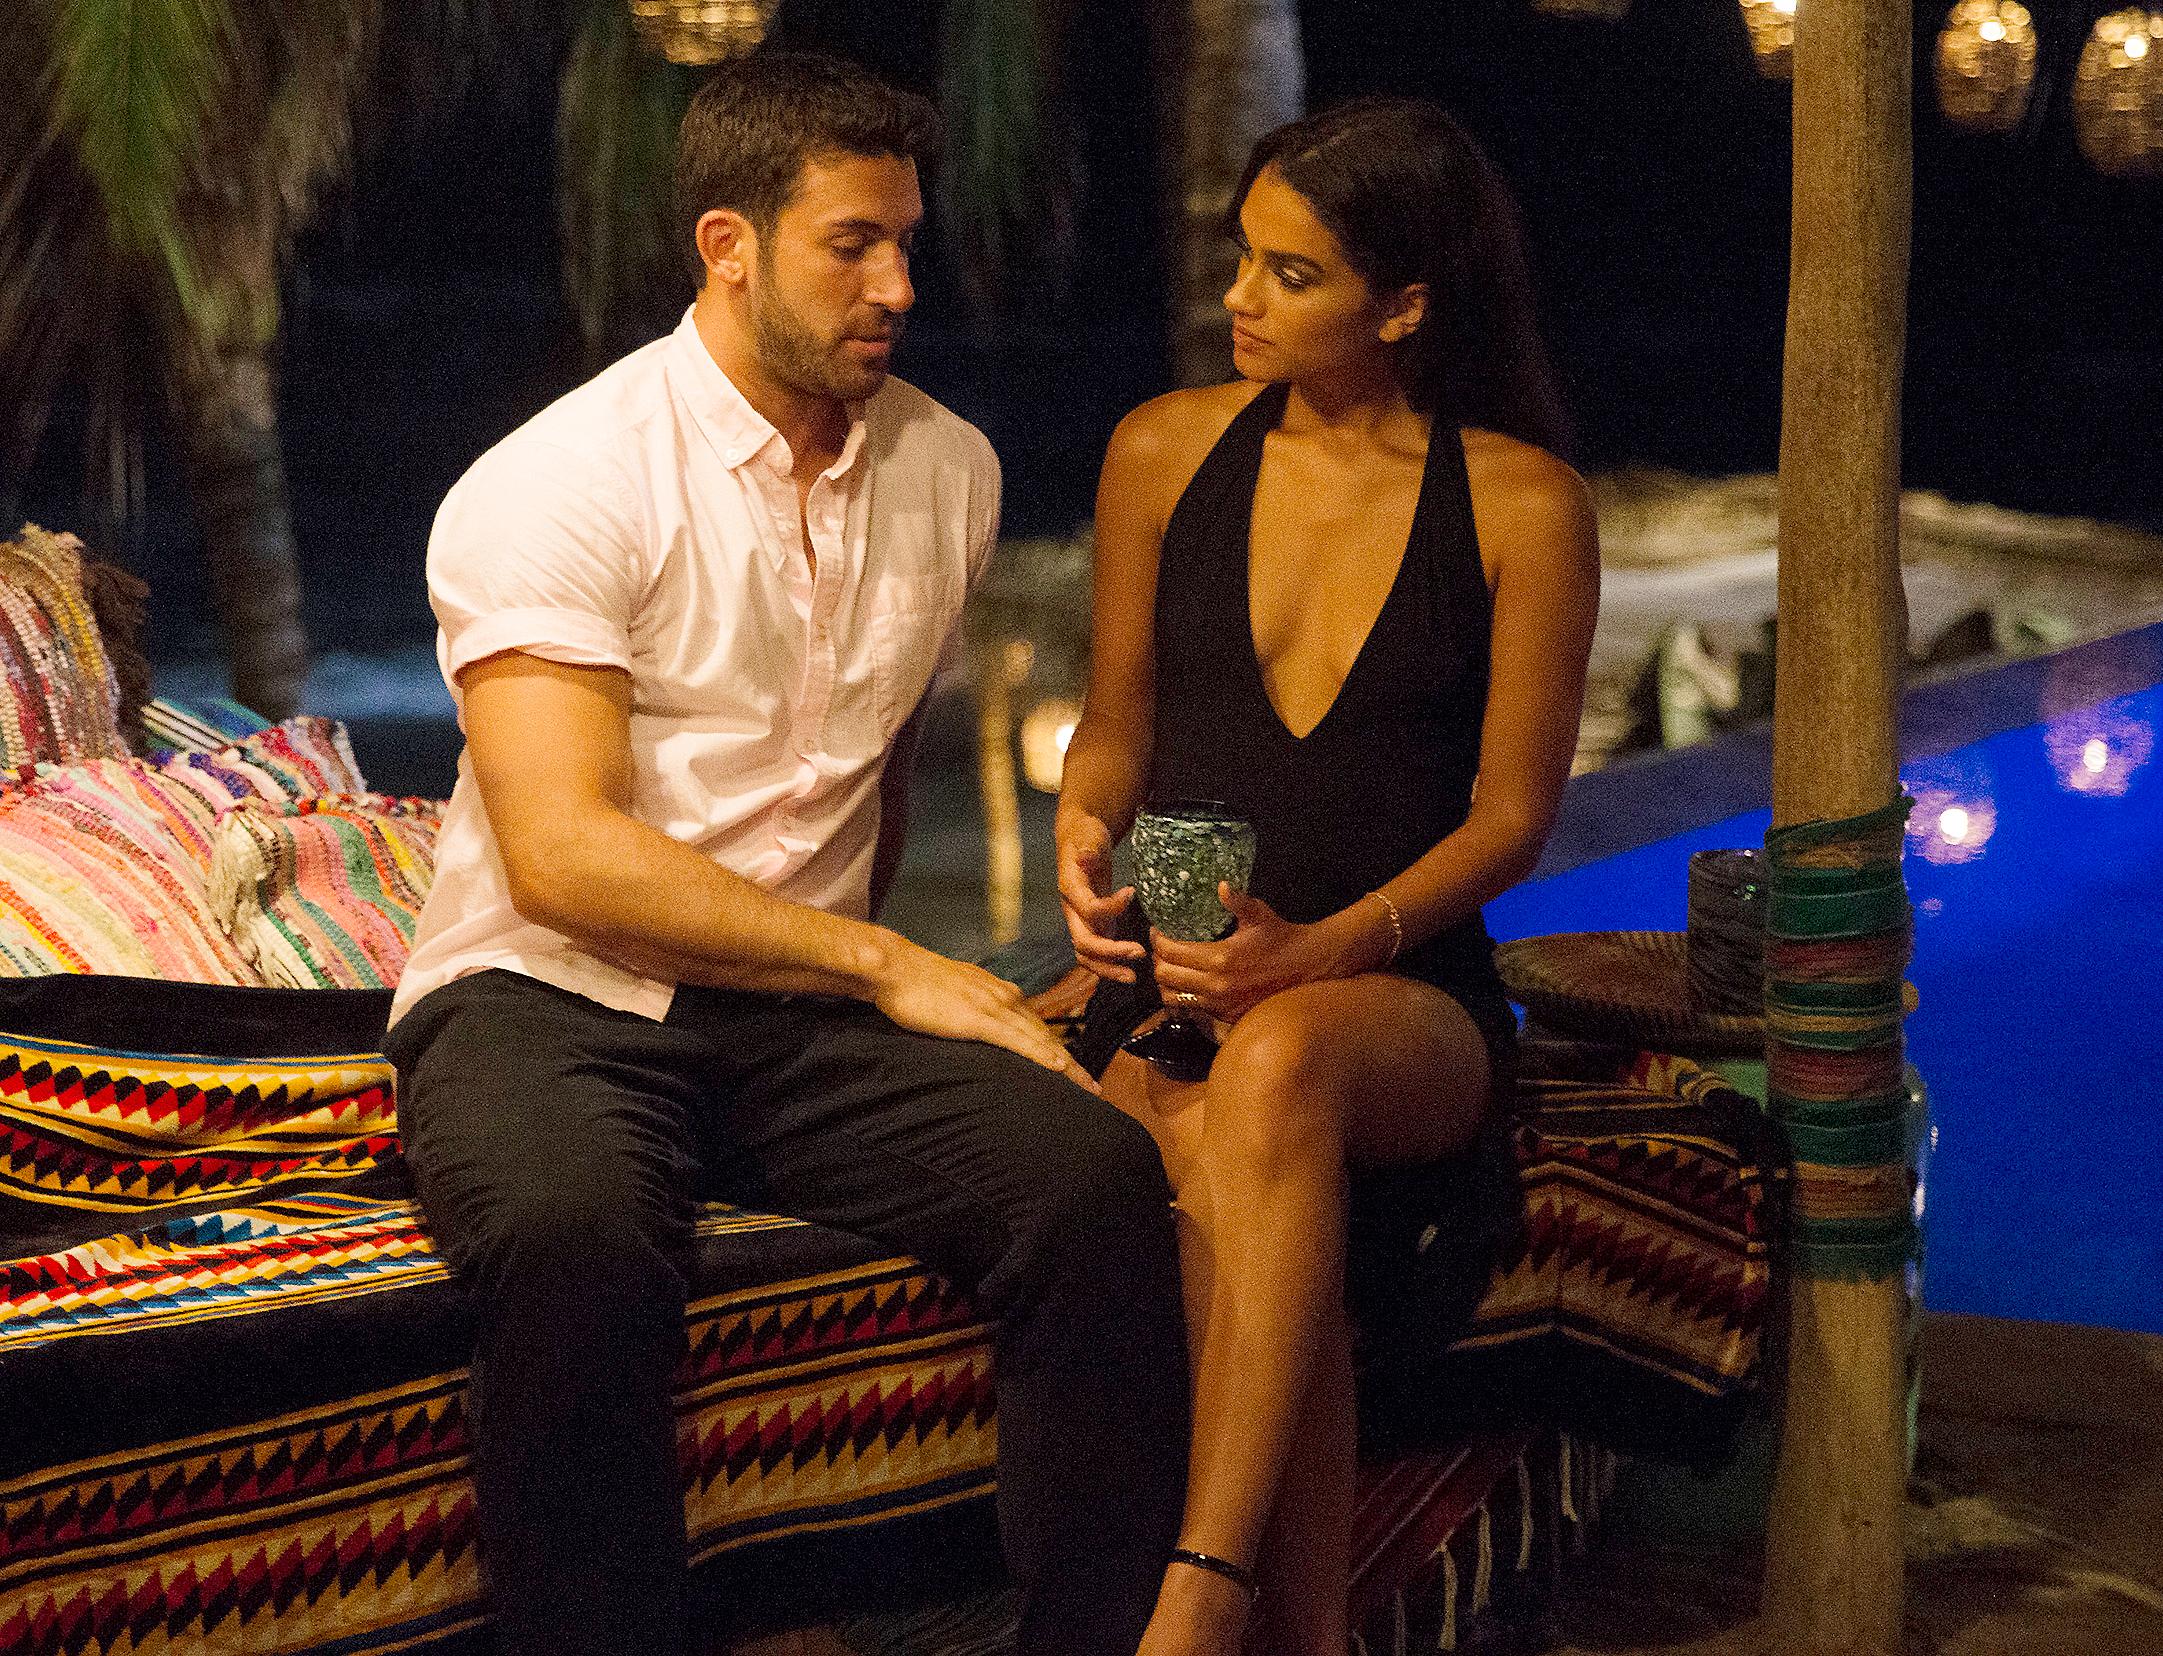 Derek Peth Taylor Nolan Bachelor in Paradise Split